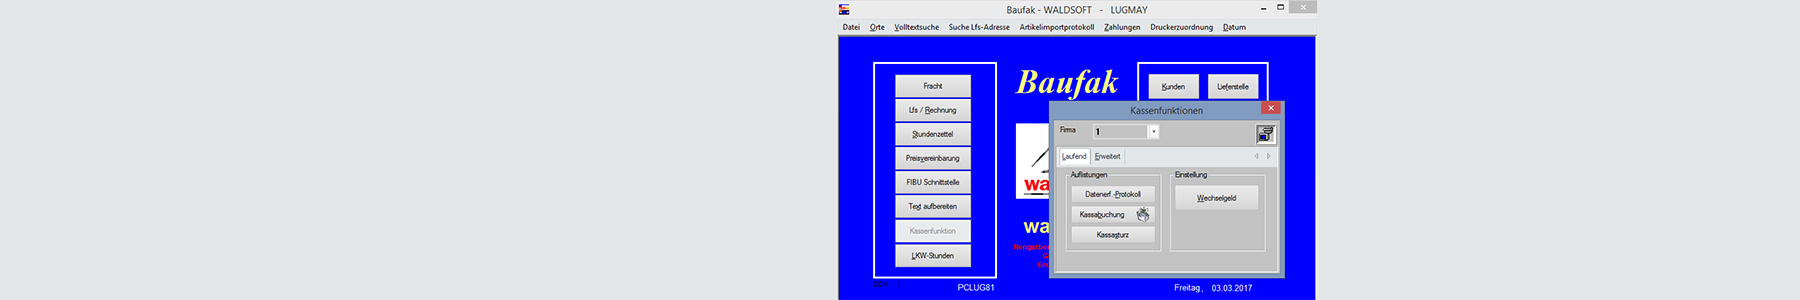 waldsoft Software Baufak